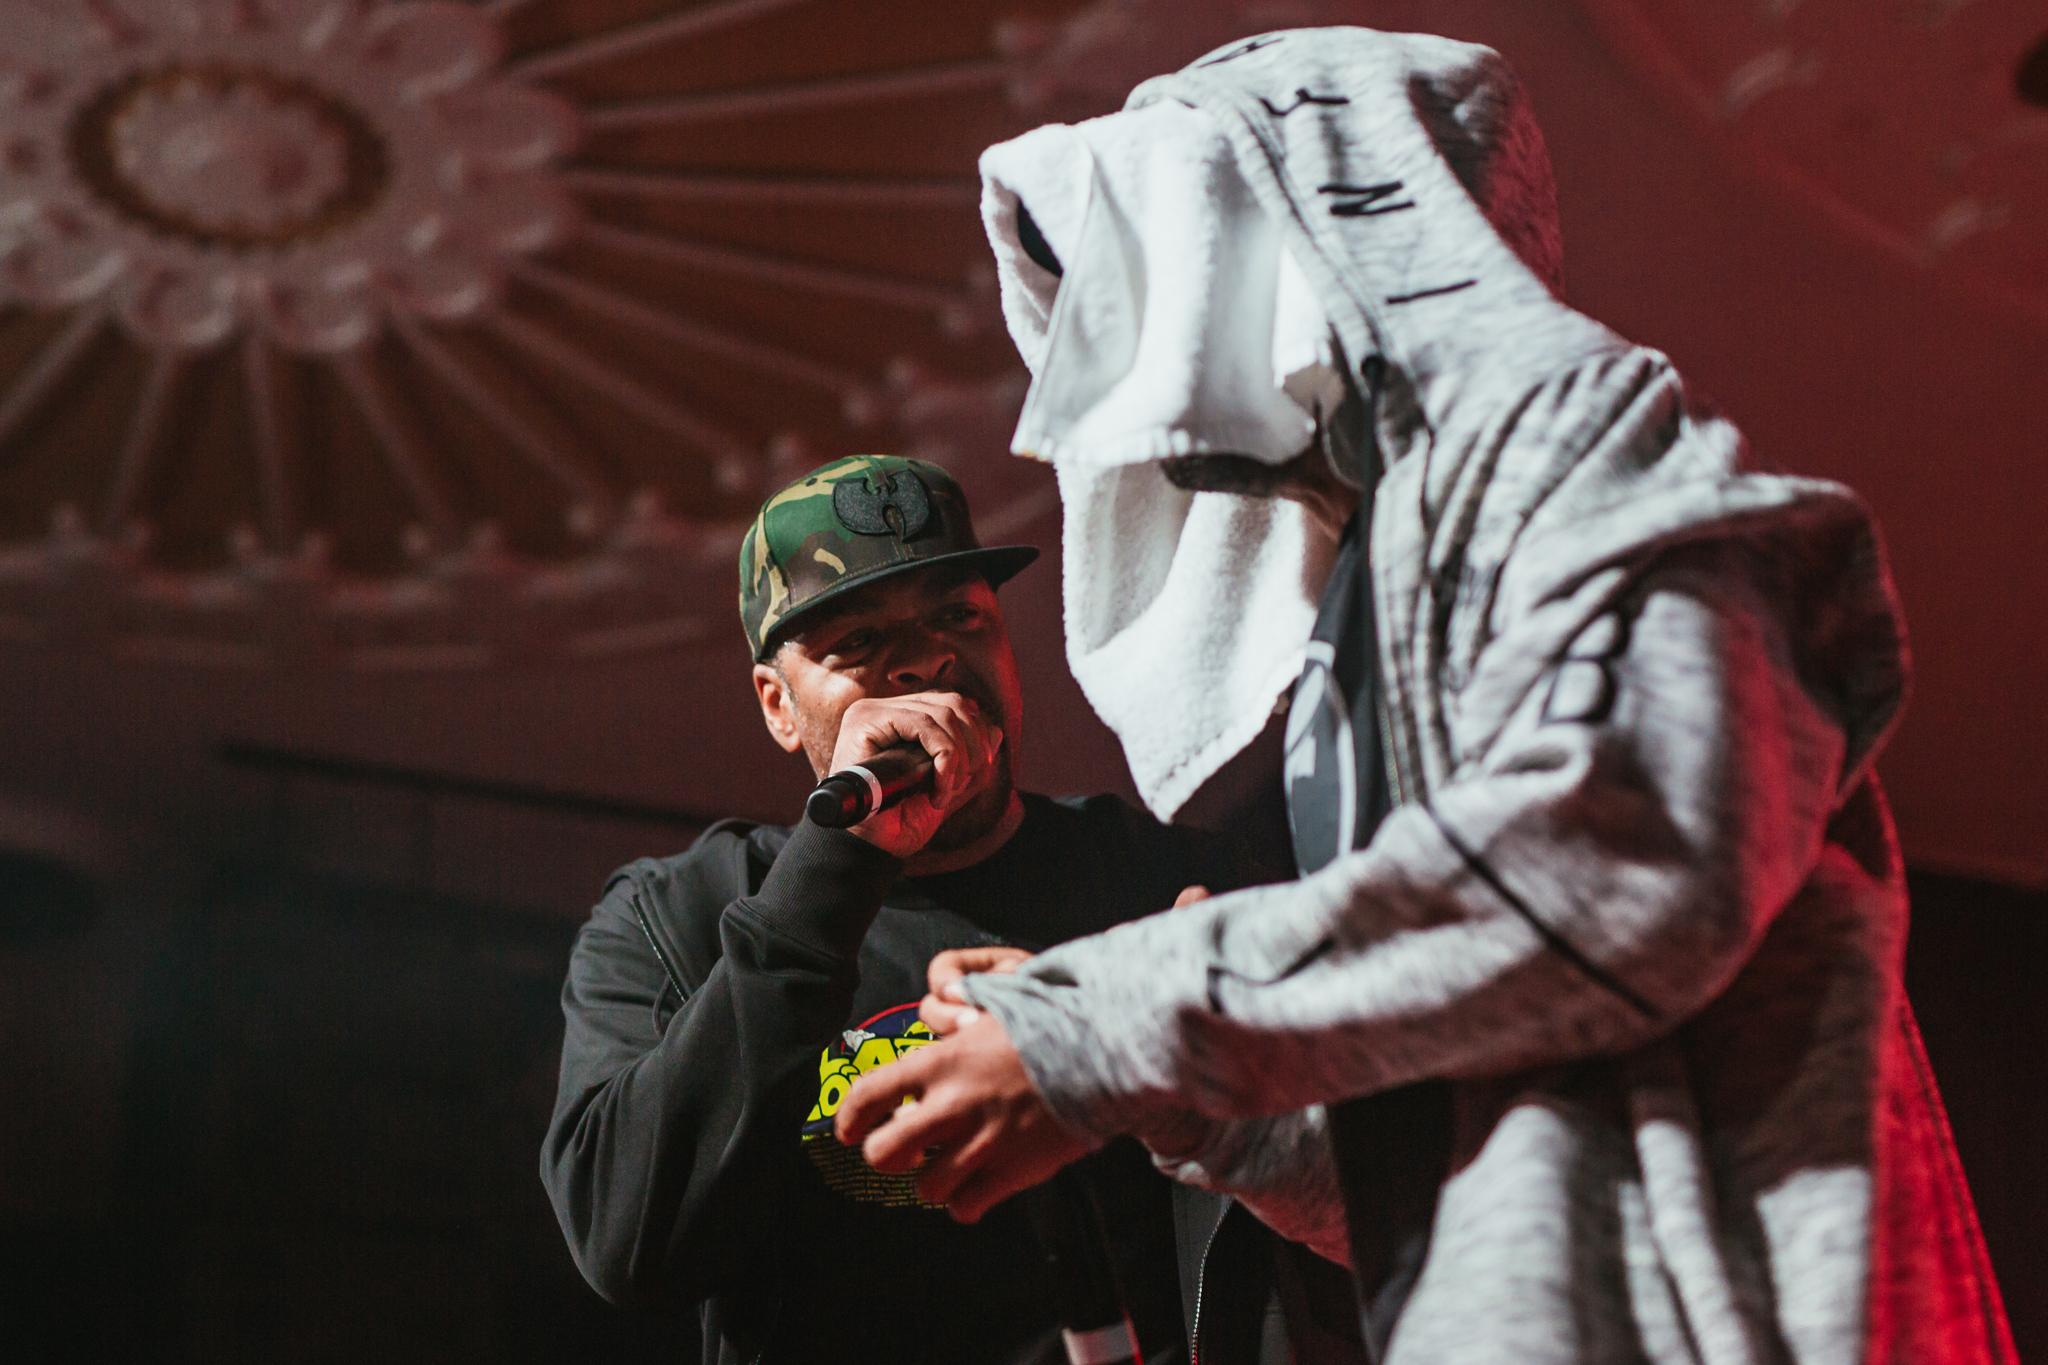 Mitch Lowe Photo - Methodman & Redman-43.jpg